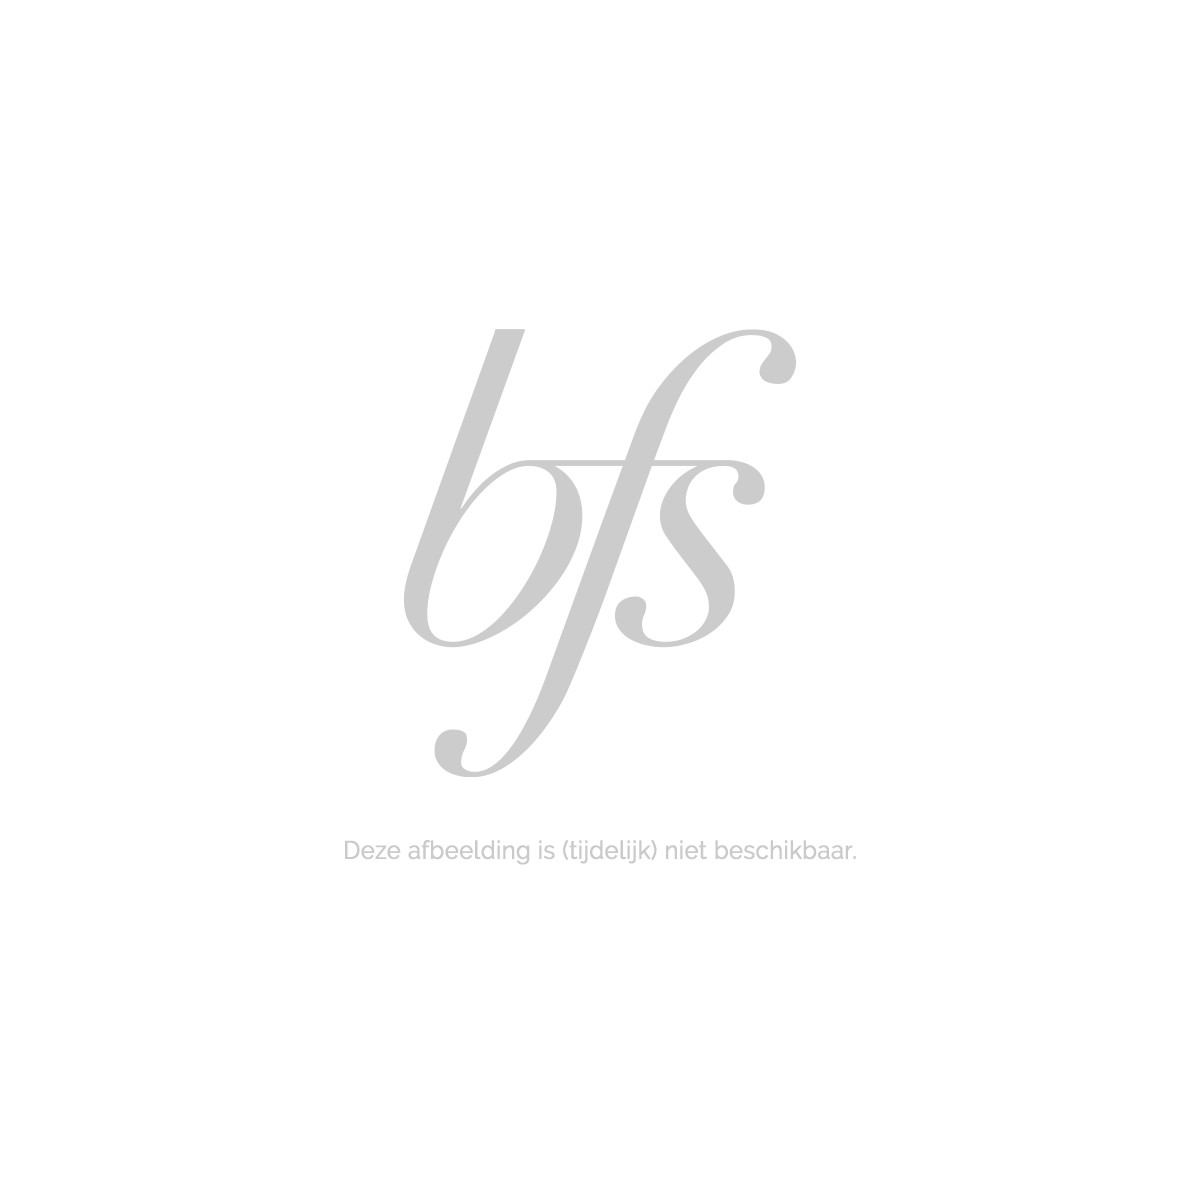 Estee Lauder Daywear Advanced Multi Pr. Oil Free Spf25 50 Ml